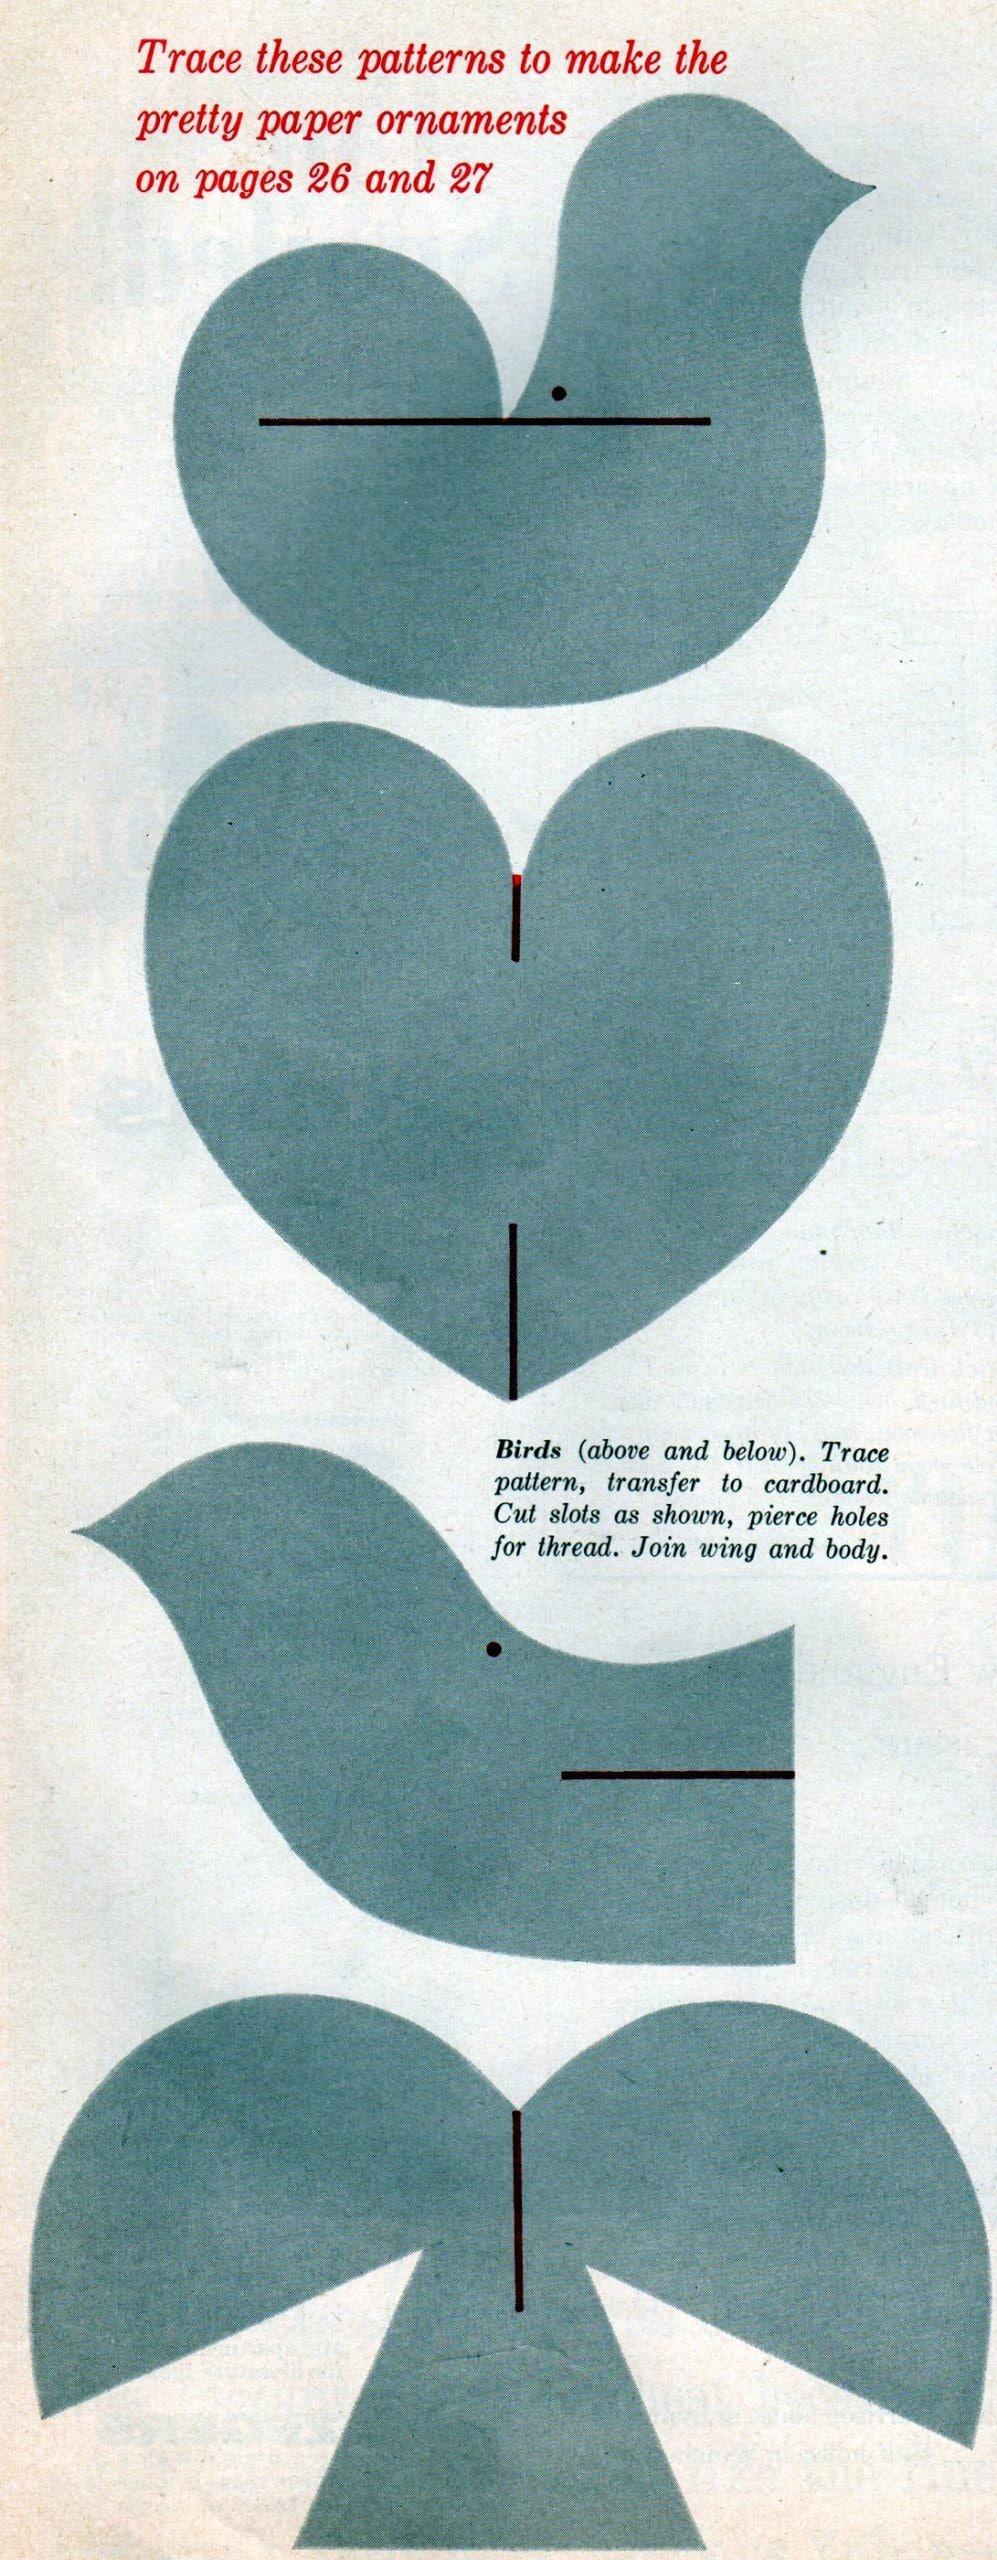 Vintage 1960 paper Christmas ornament craft diagrams (1)